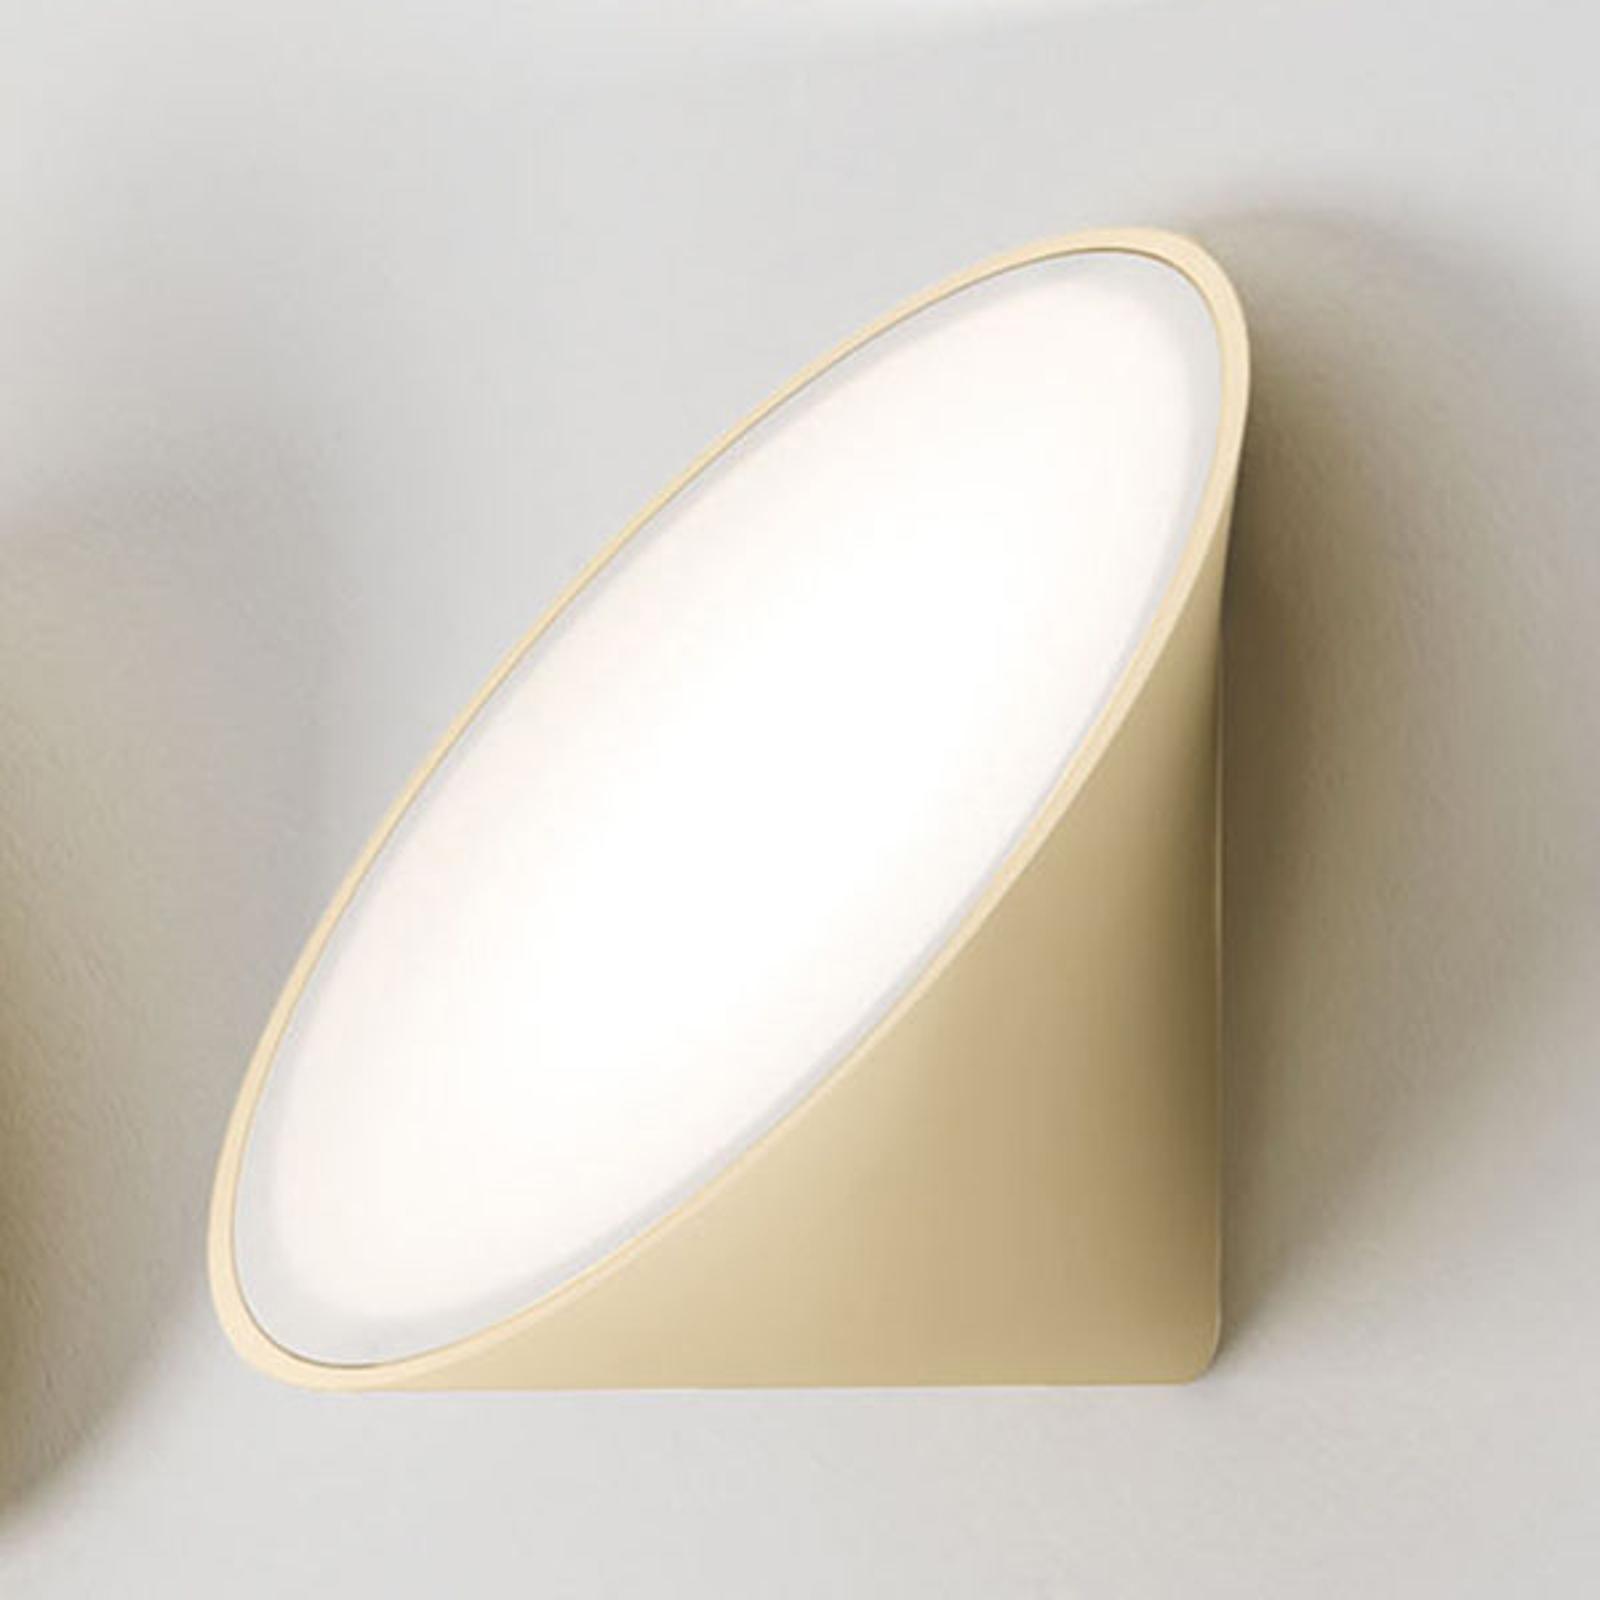 Axolight Orchid applique LED, sable